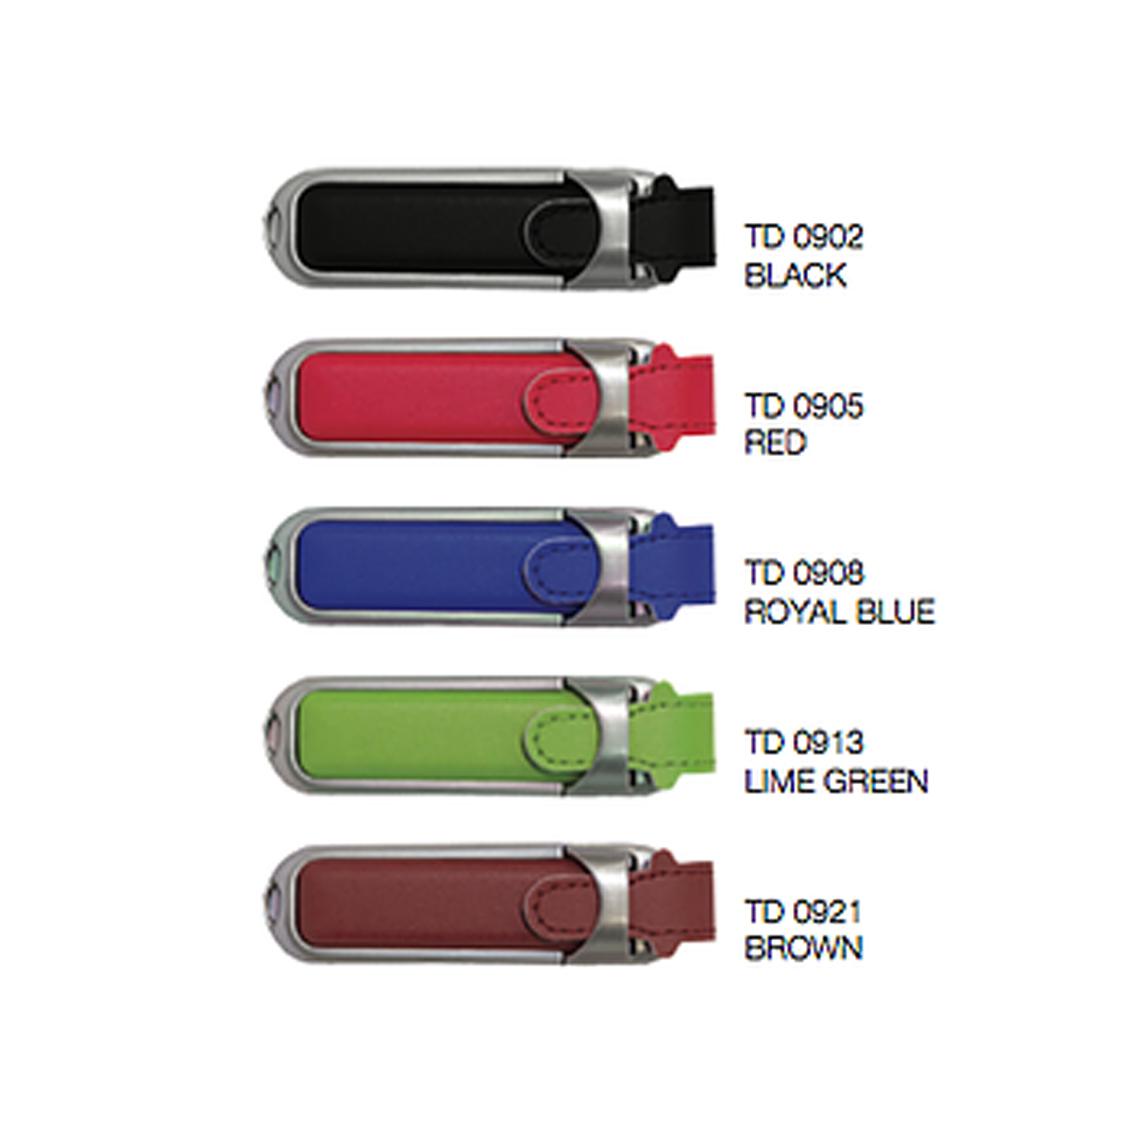 TD09 8GB 3